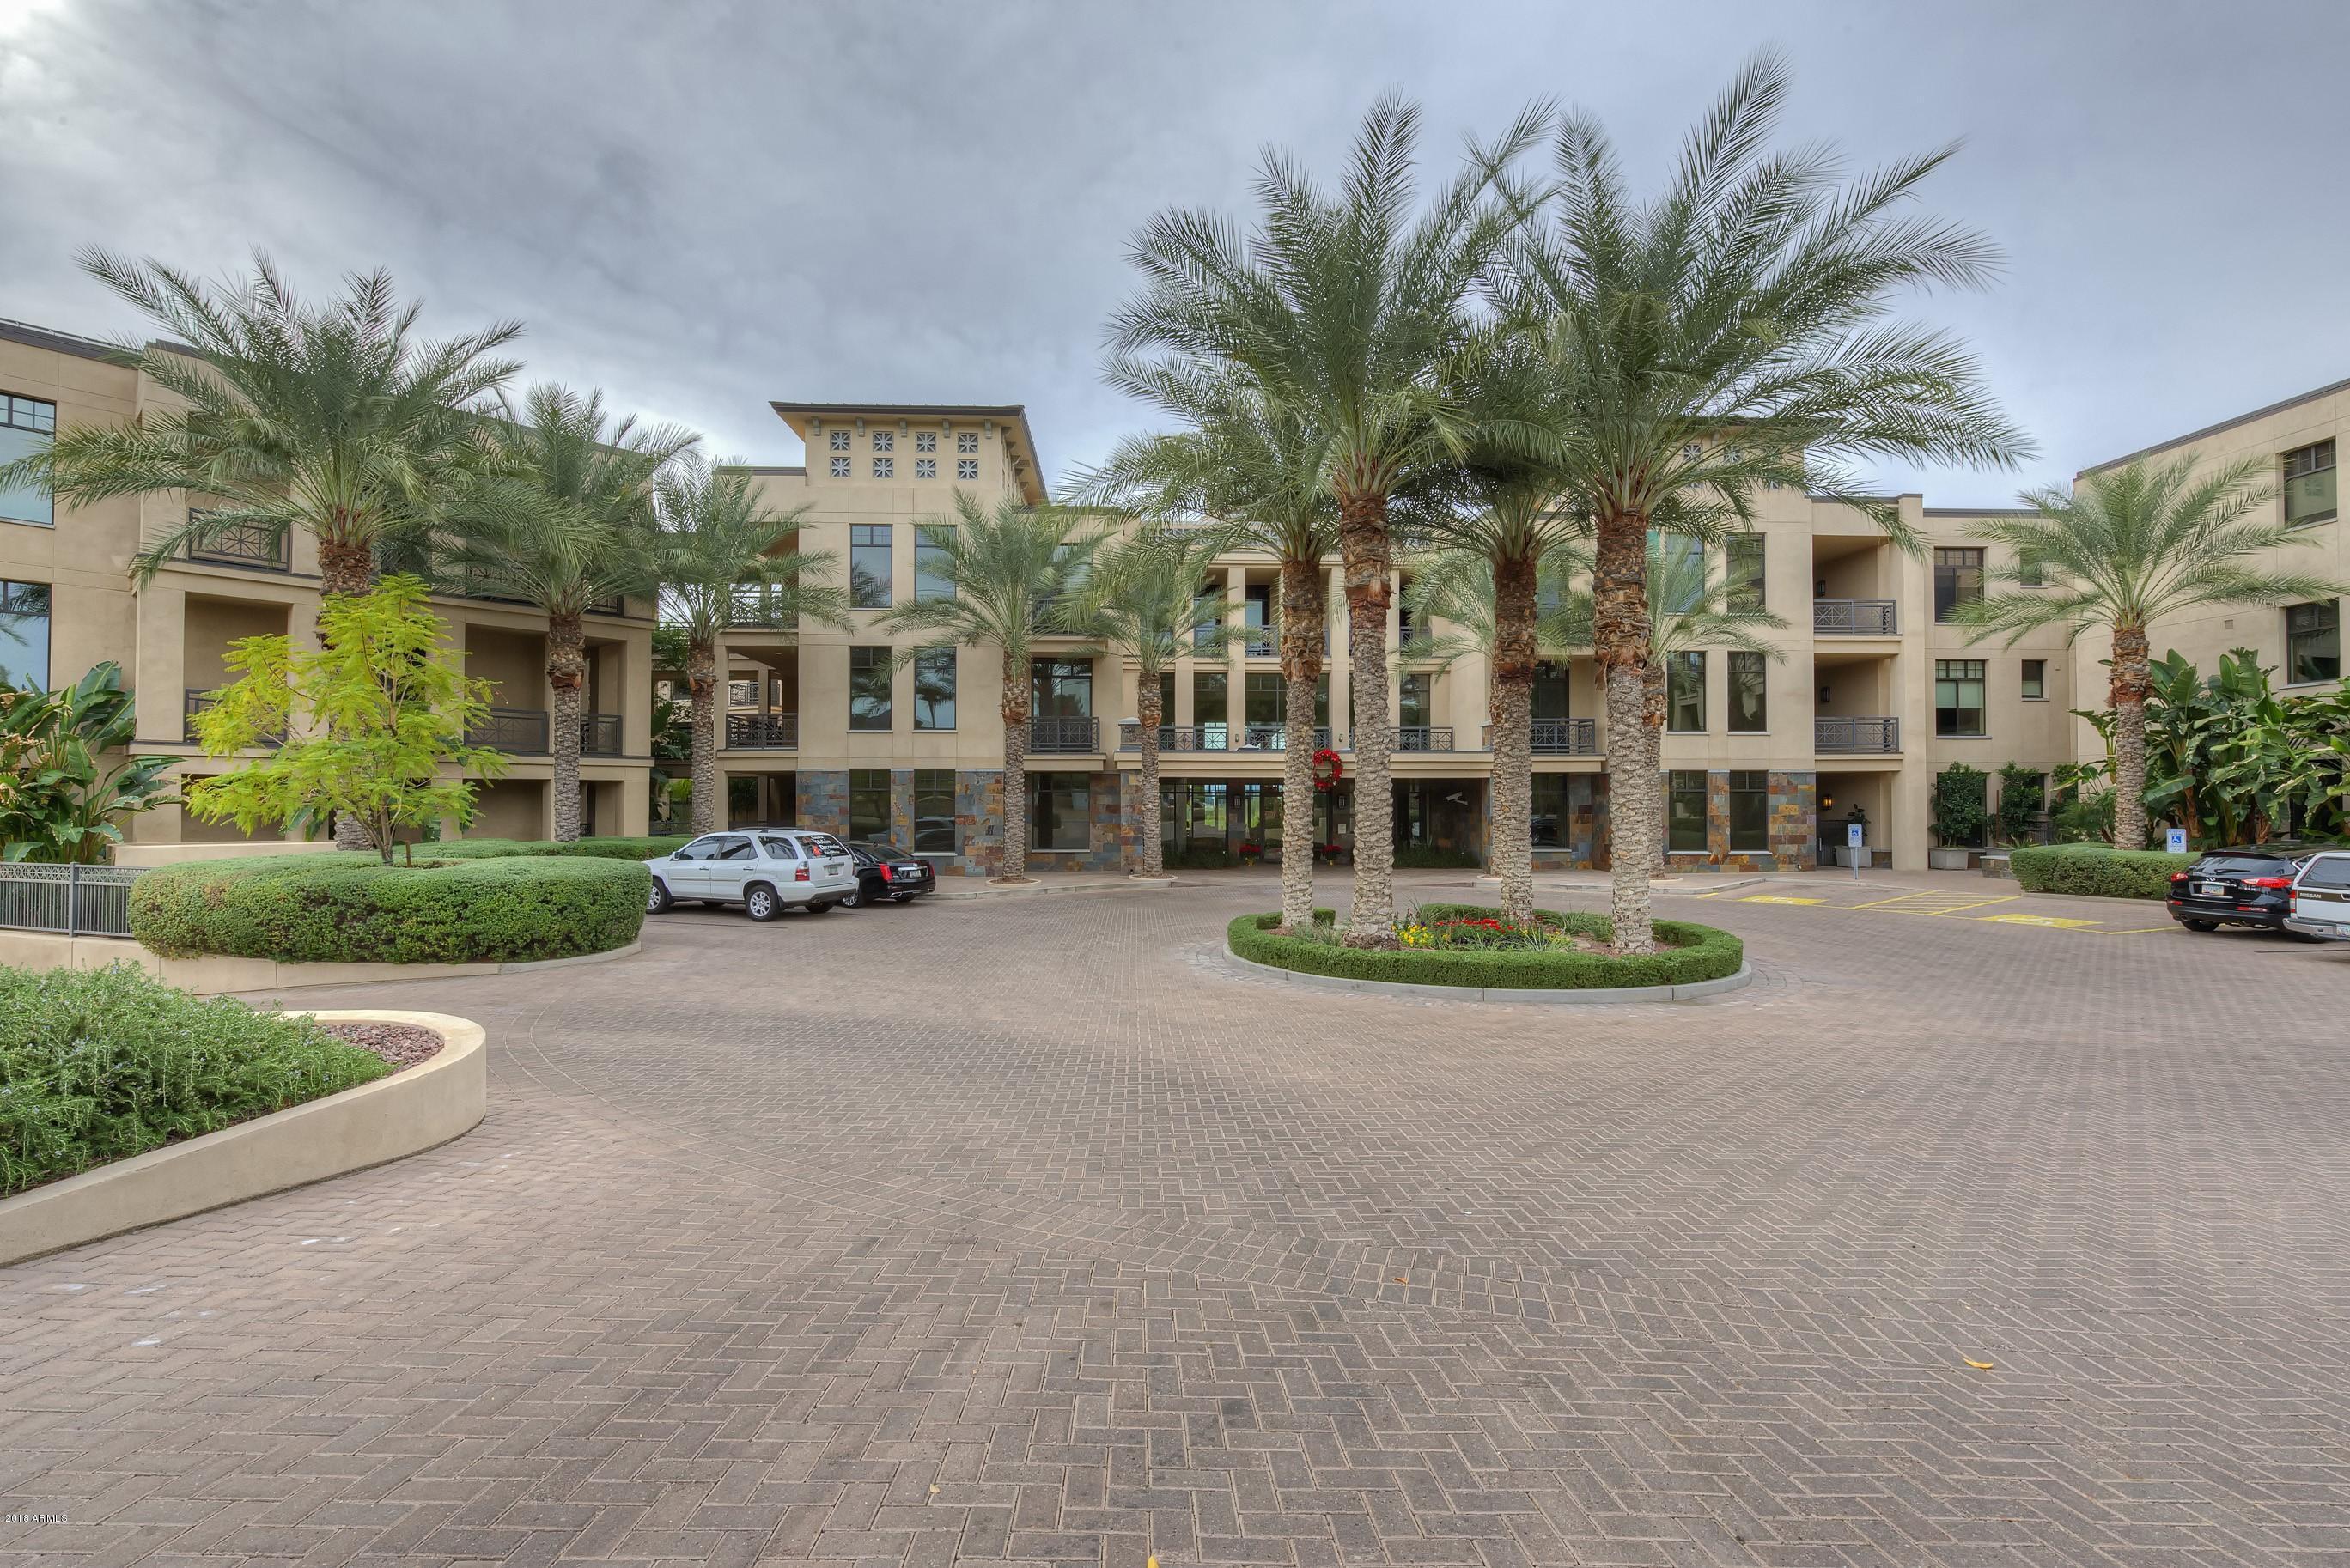 Photo of 8 E BILTMORE Estate #308, Phoenix, AZ 85016